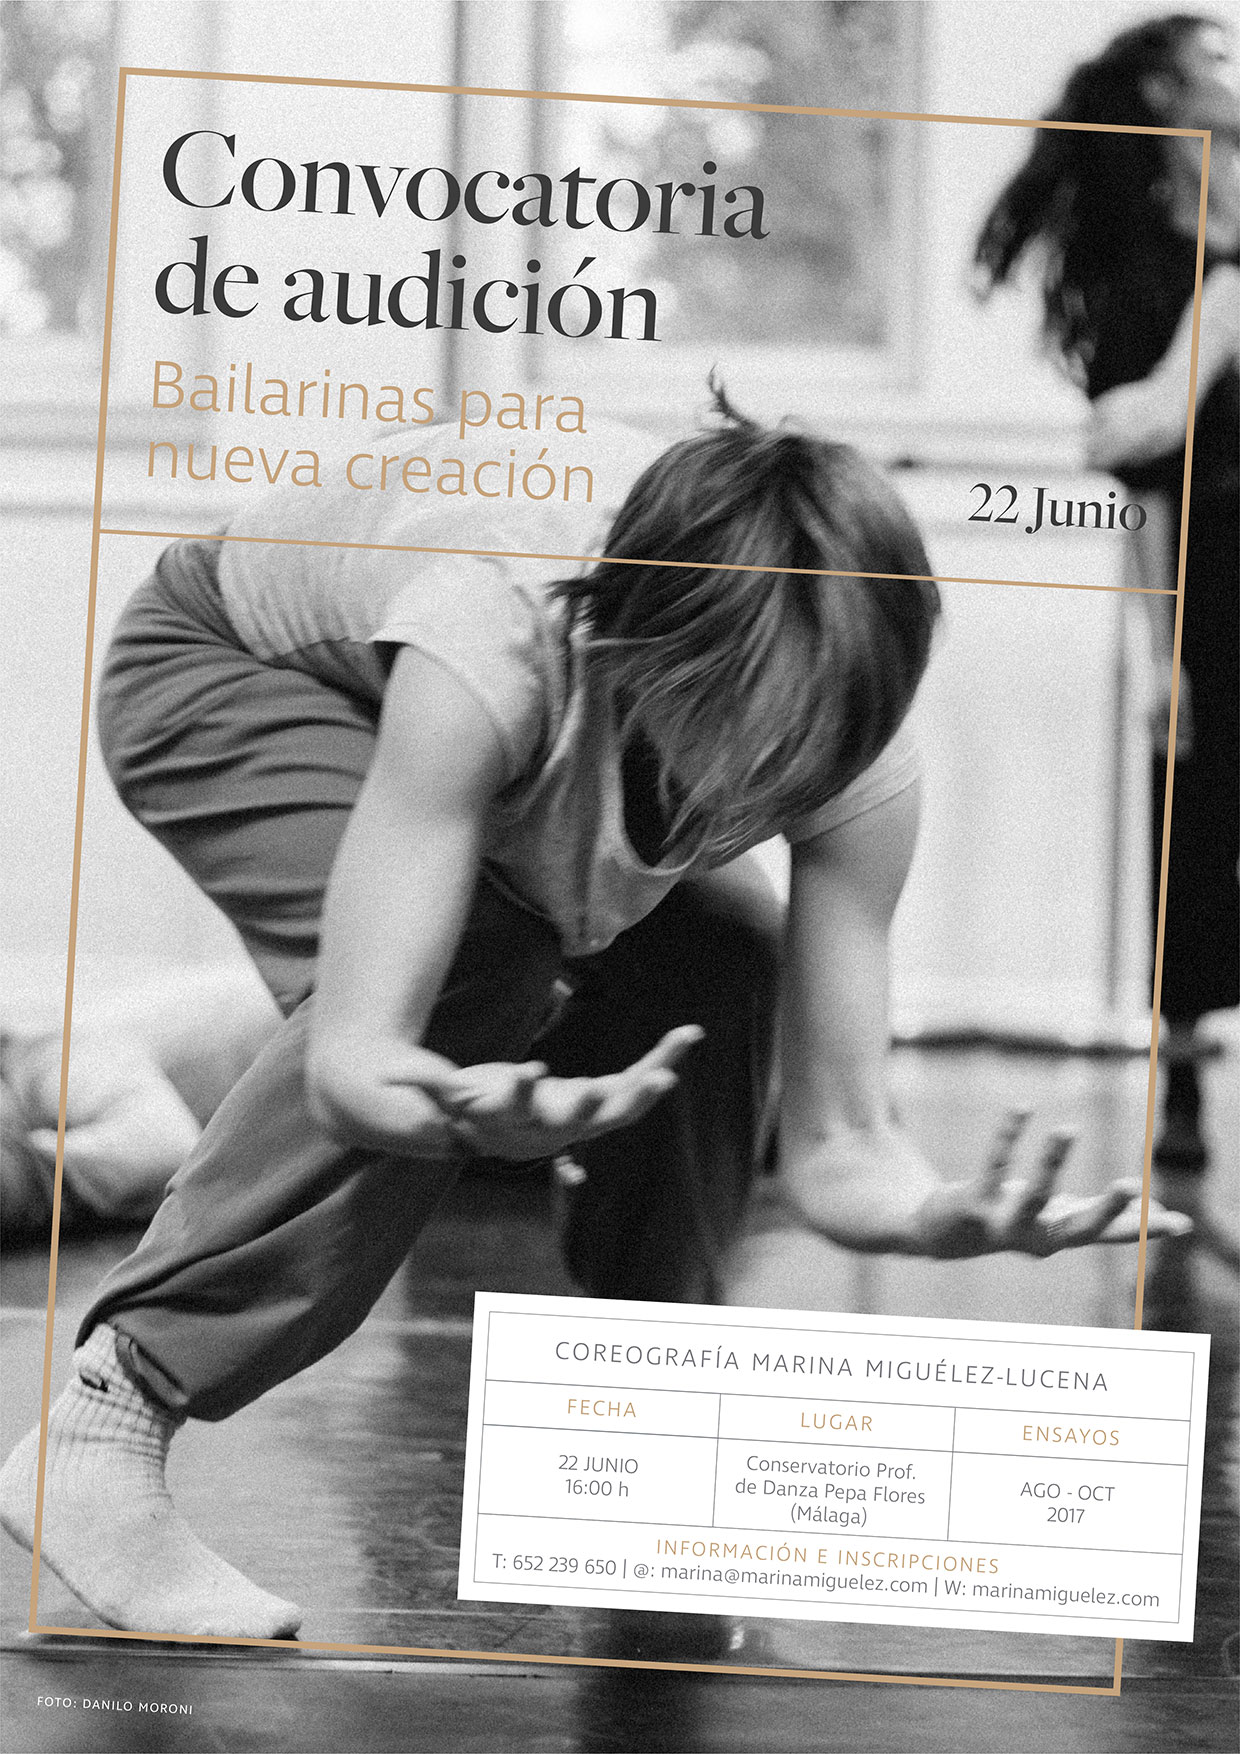 Marina_Miguelez_Lucena_danza_audition_photo_Danilo_Moroni.jpg